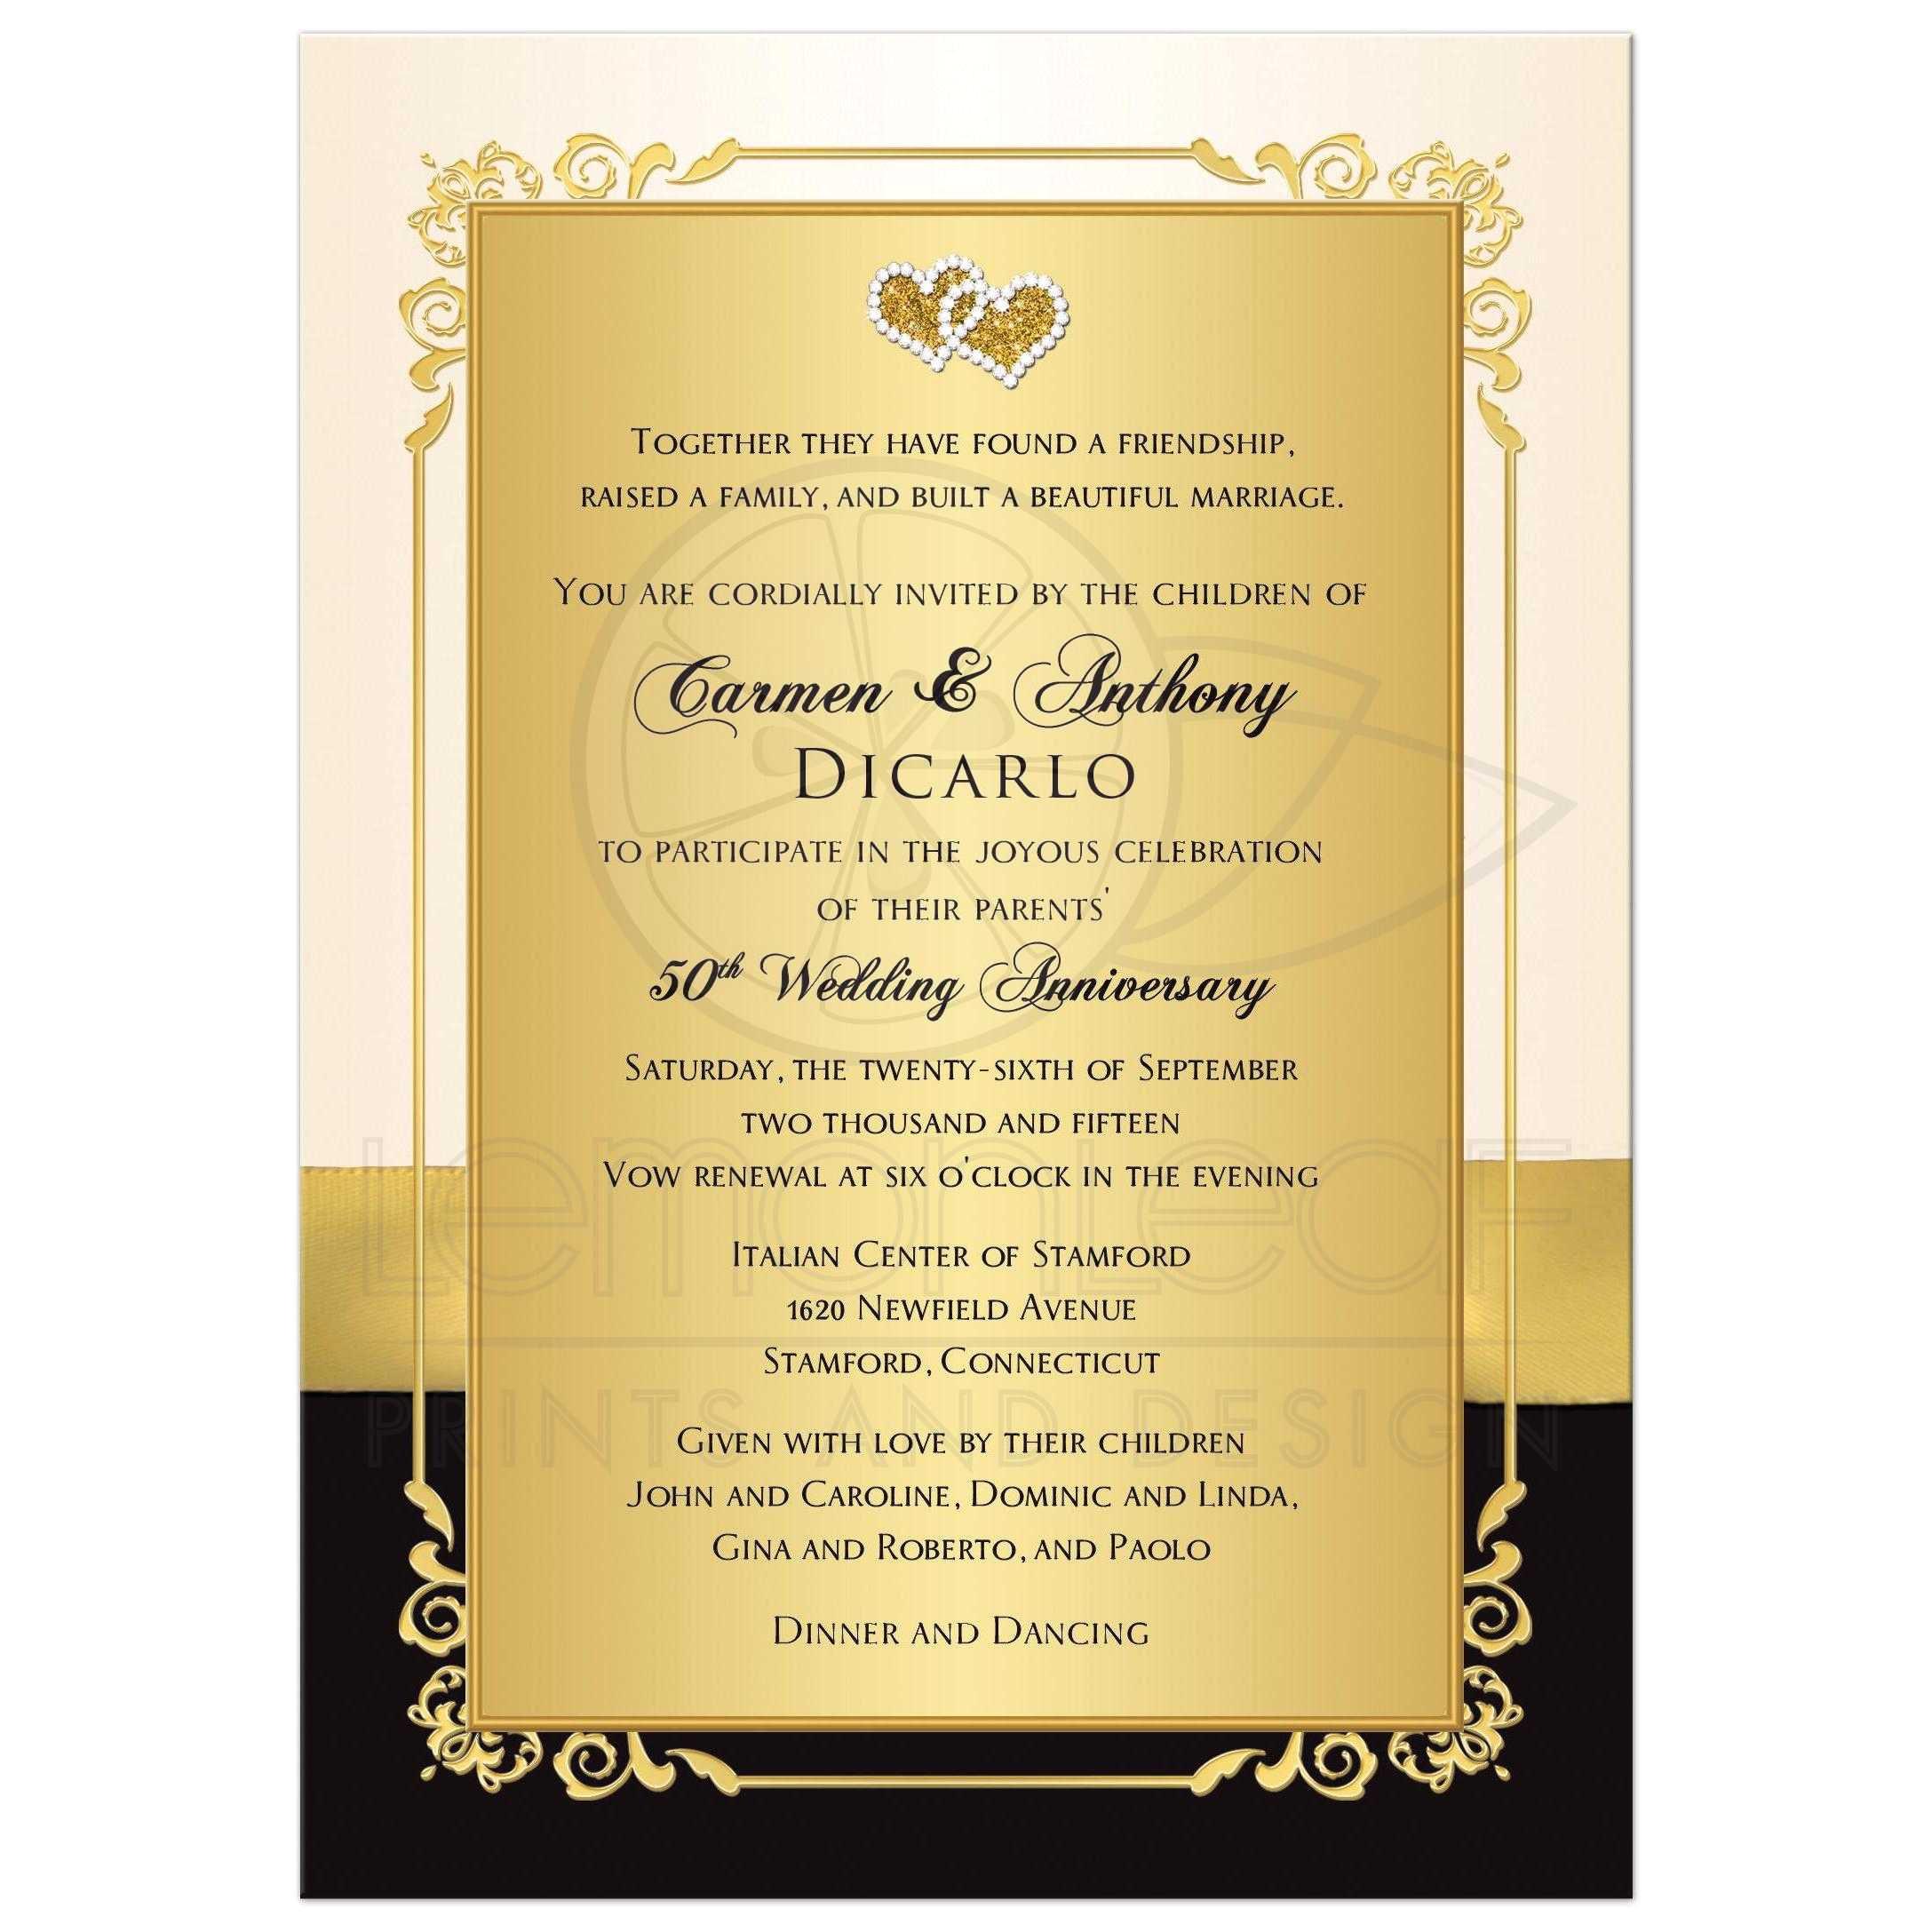 golden wedding anniversary invitation cards jpg